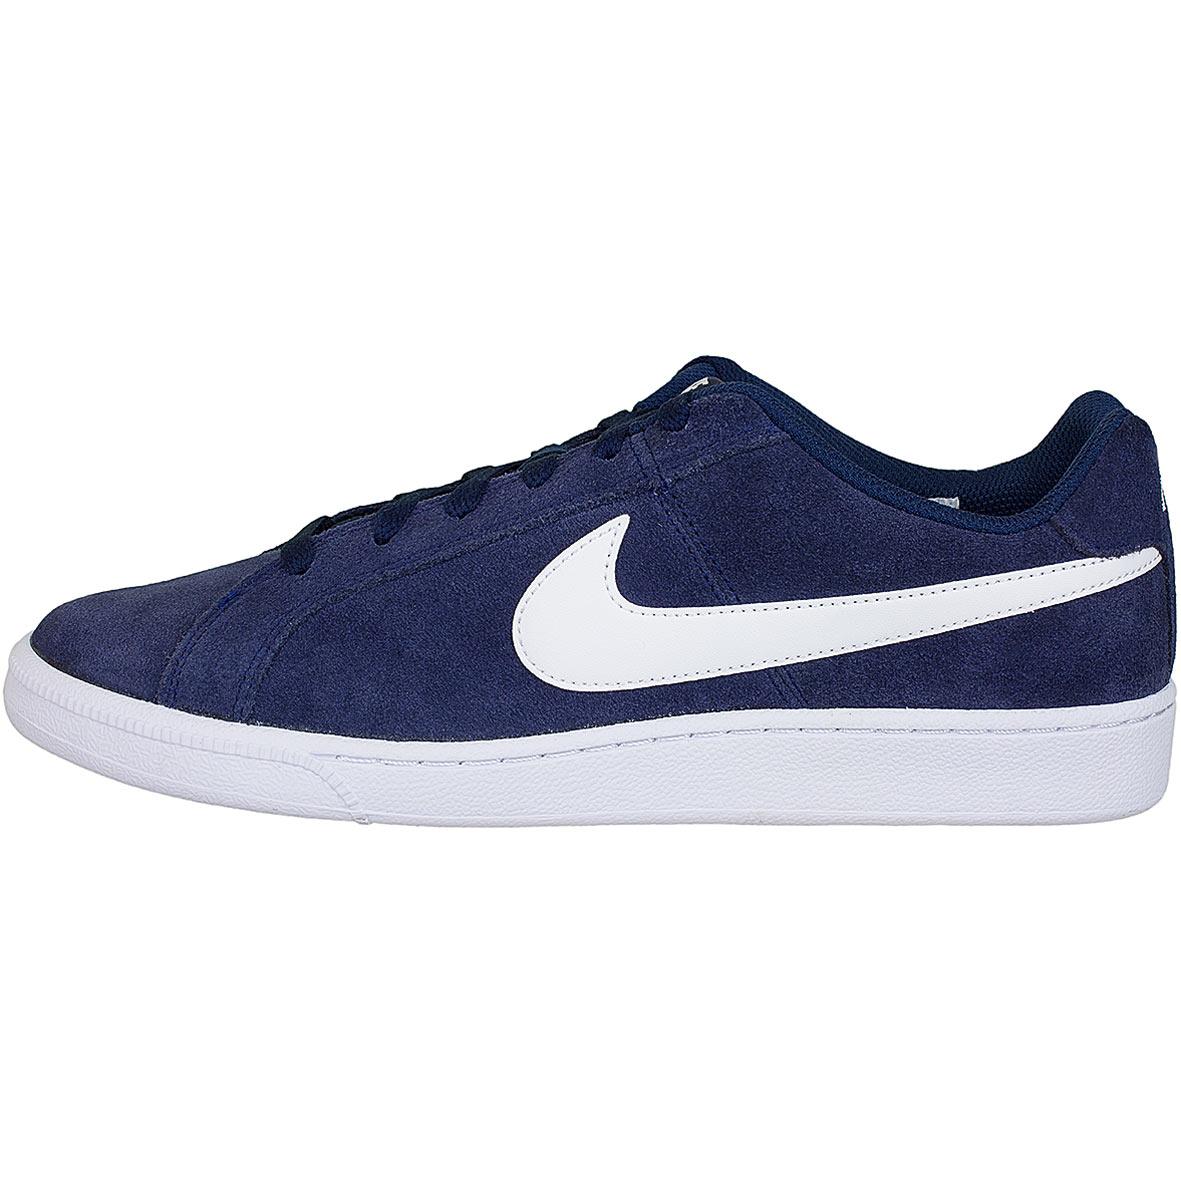 cf2c5760663485 ☆ Nike Sneaker Court Royale Suede dunkelblau weiß - hier bestellen!